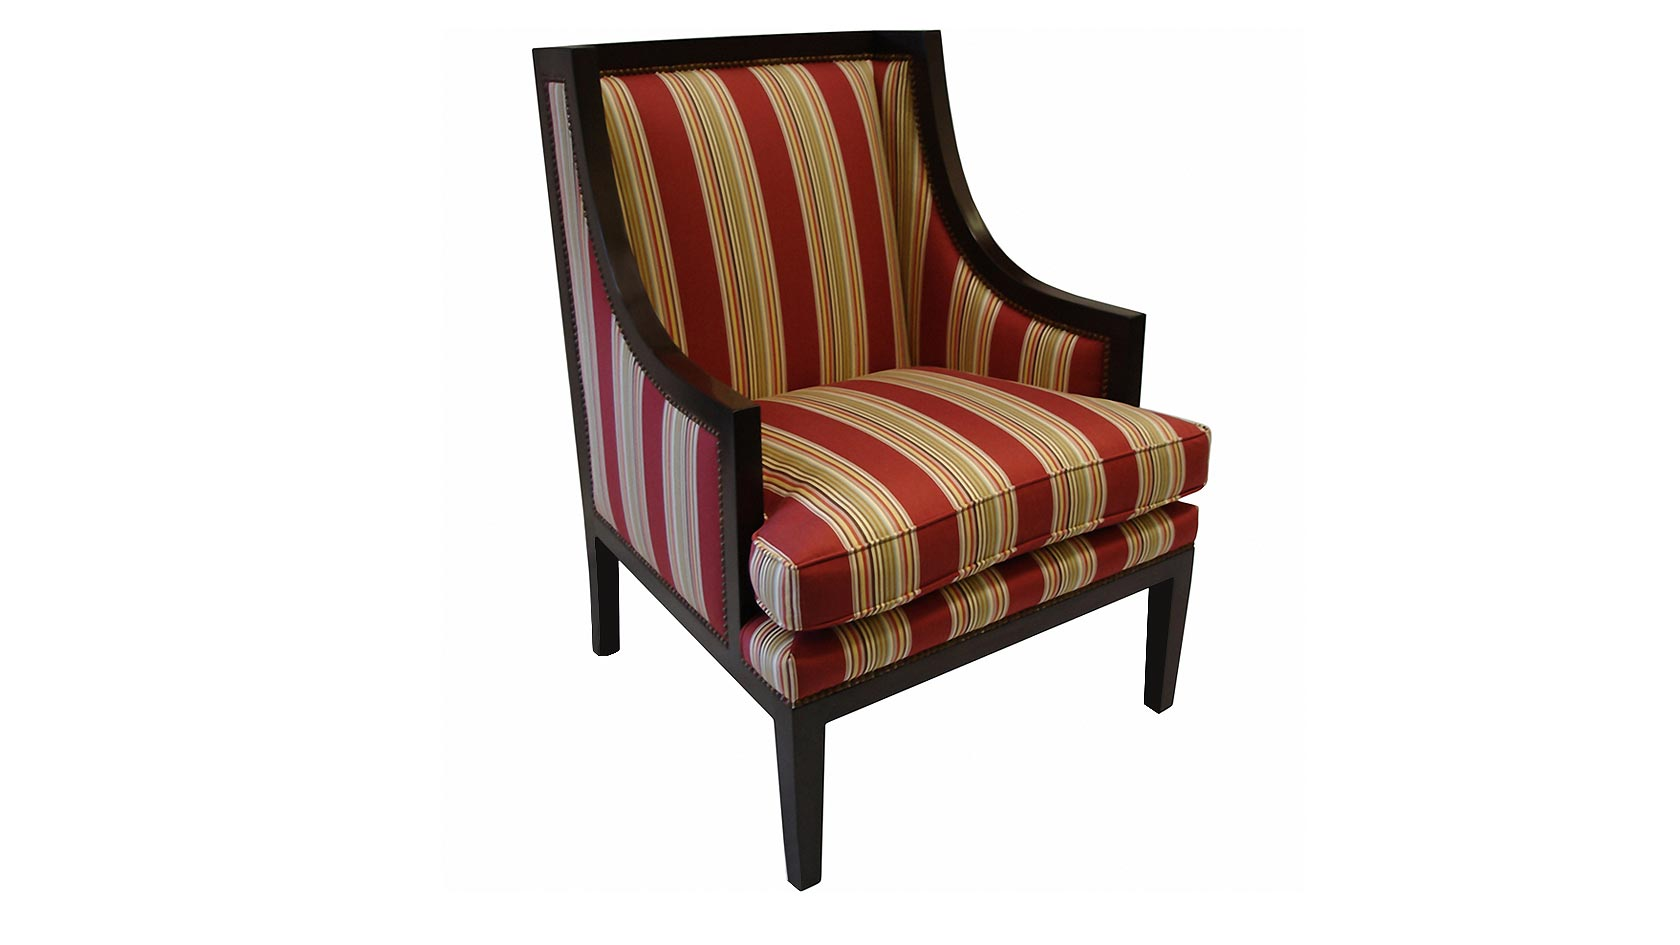 Fairbanks Lounge Chair